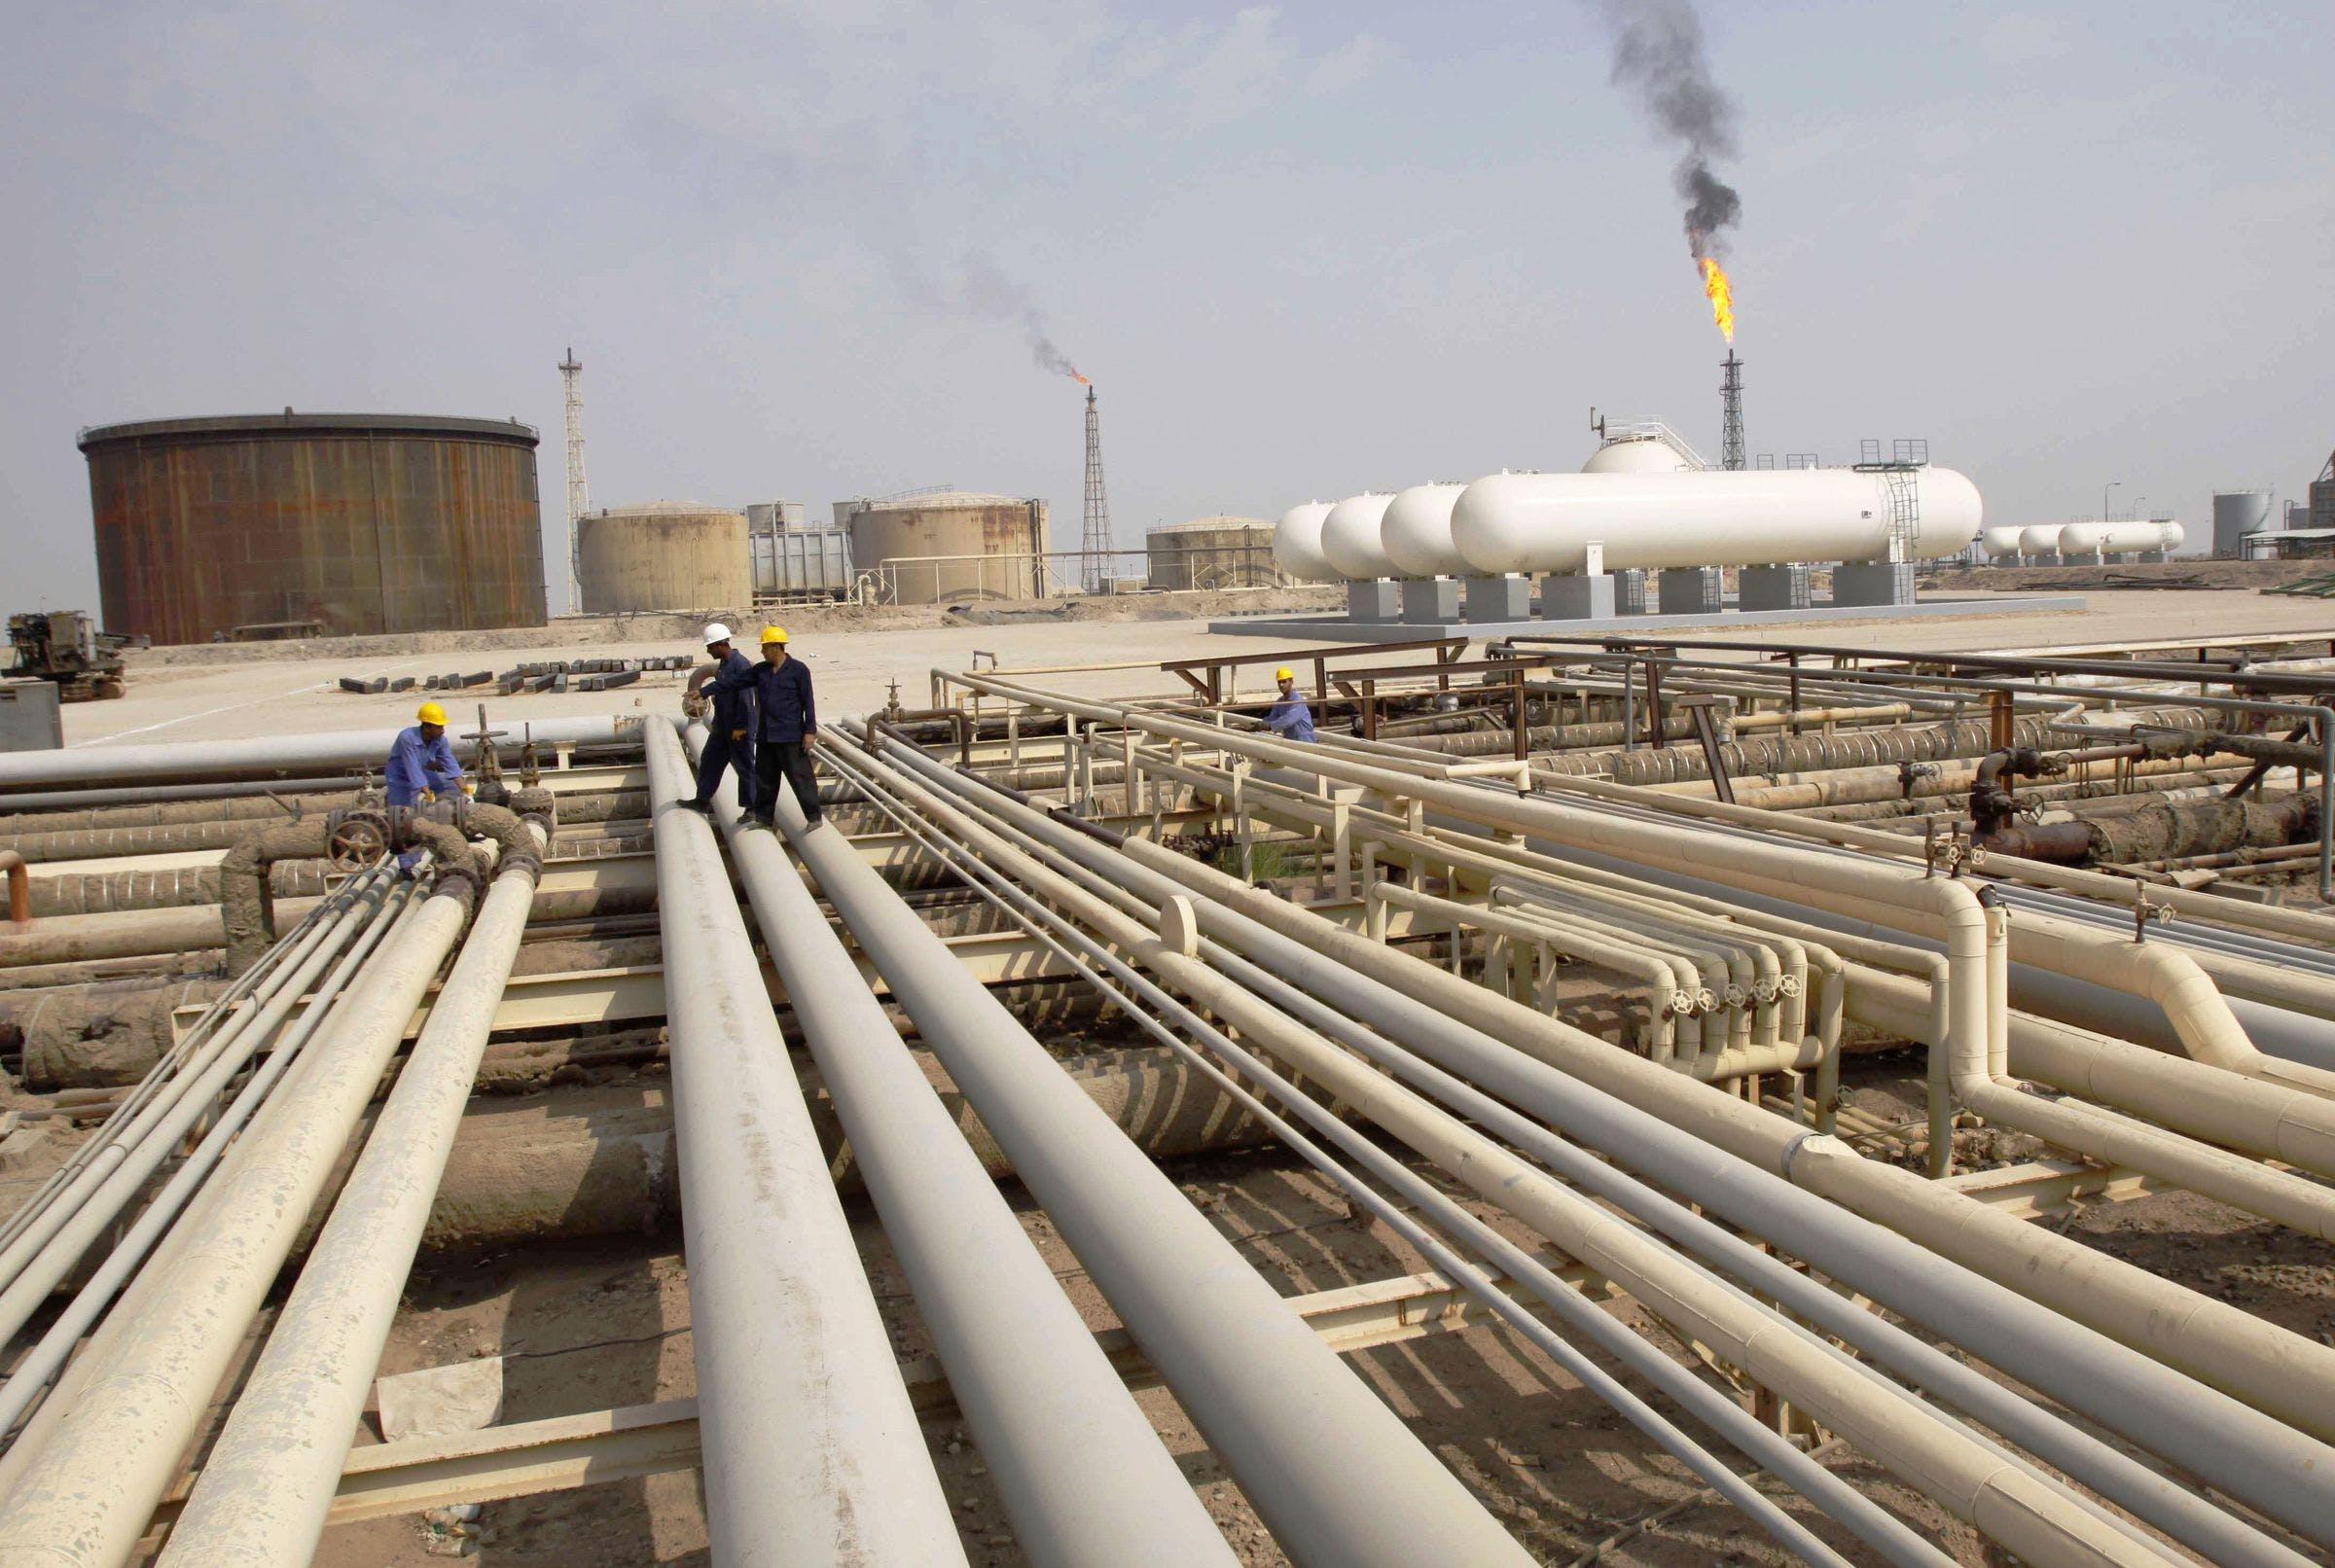 Iraquis walking on oil pipelines